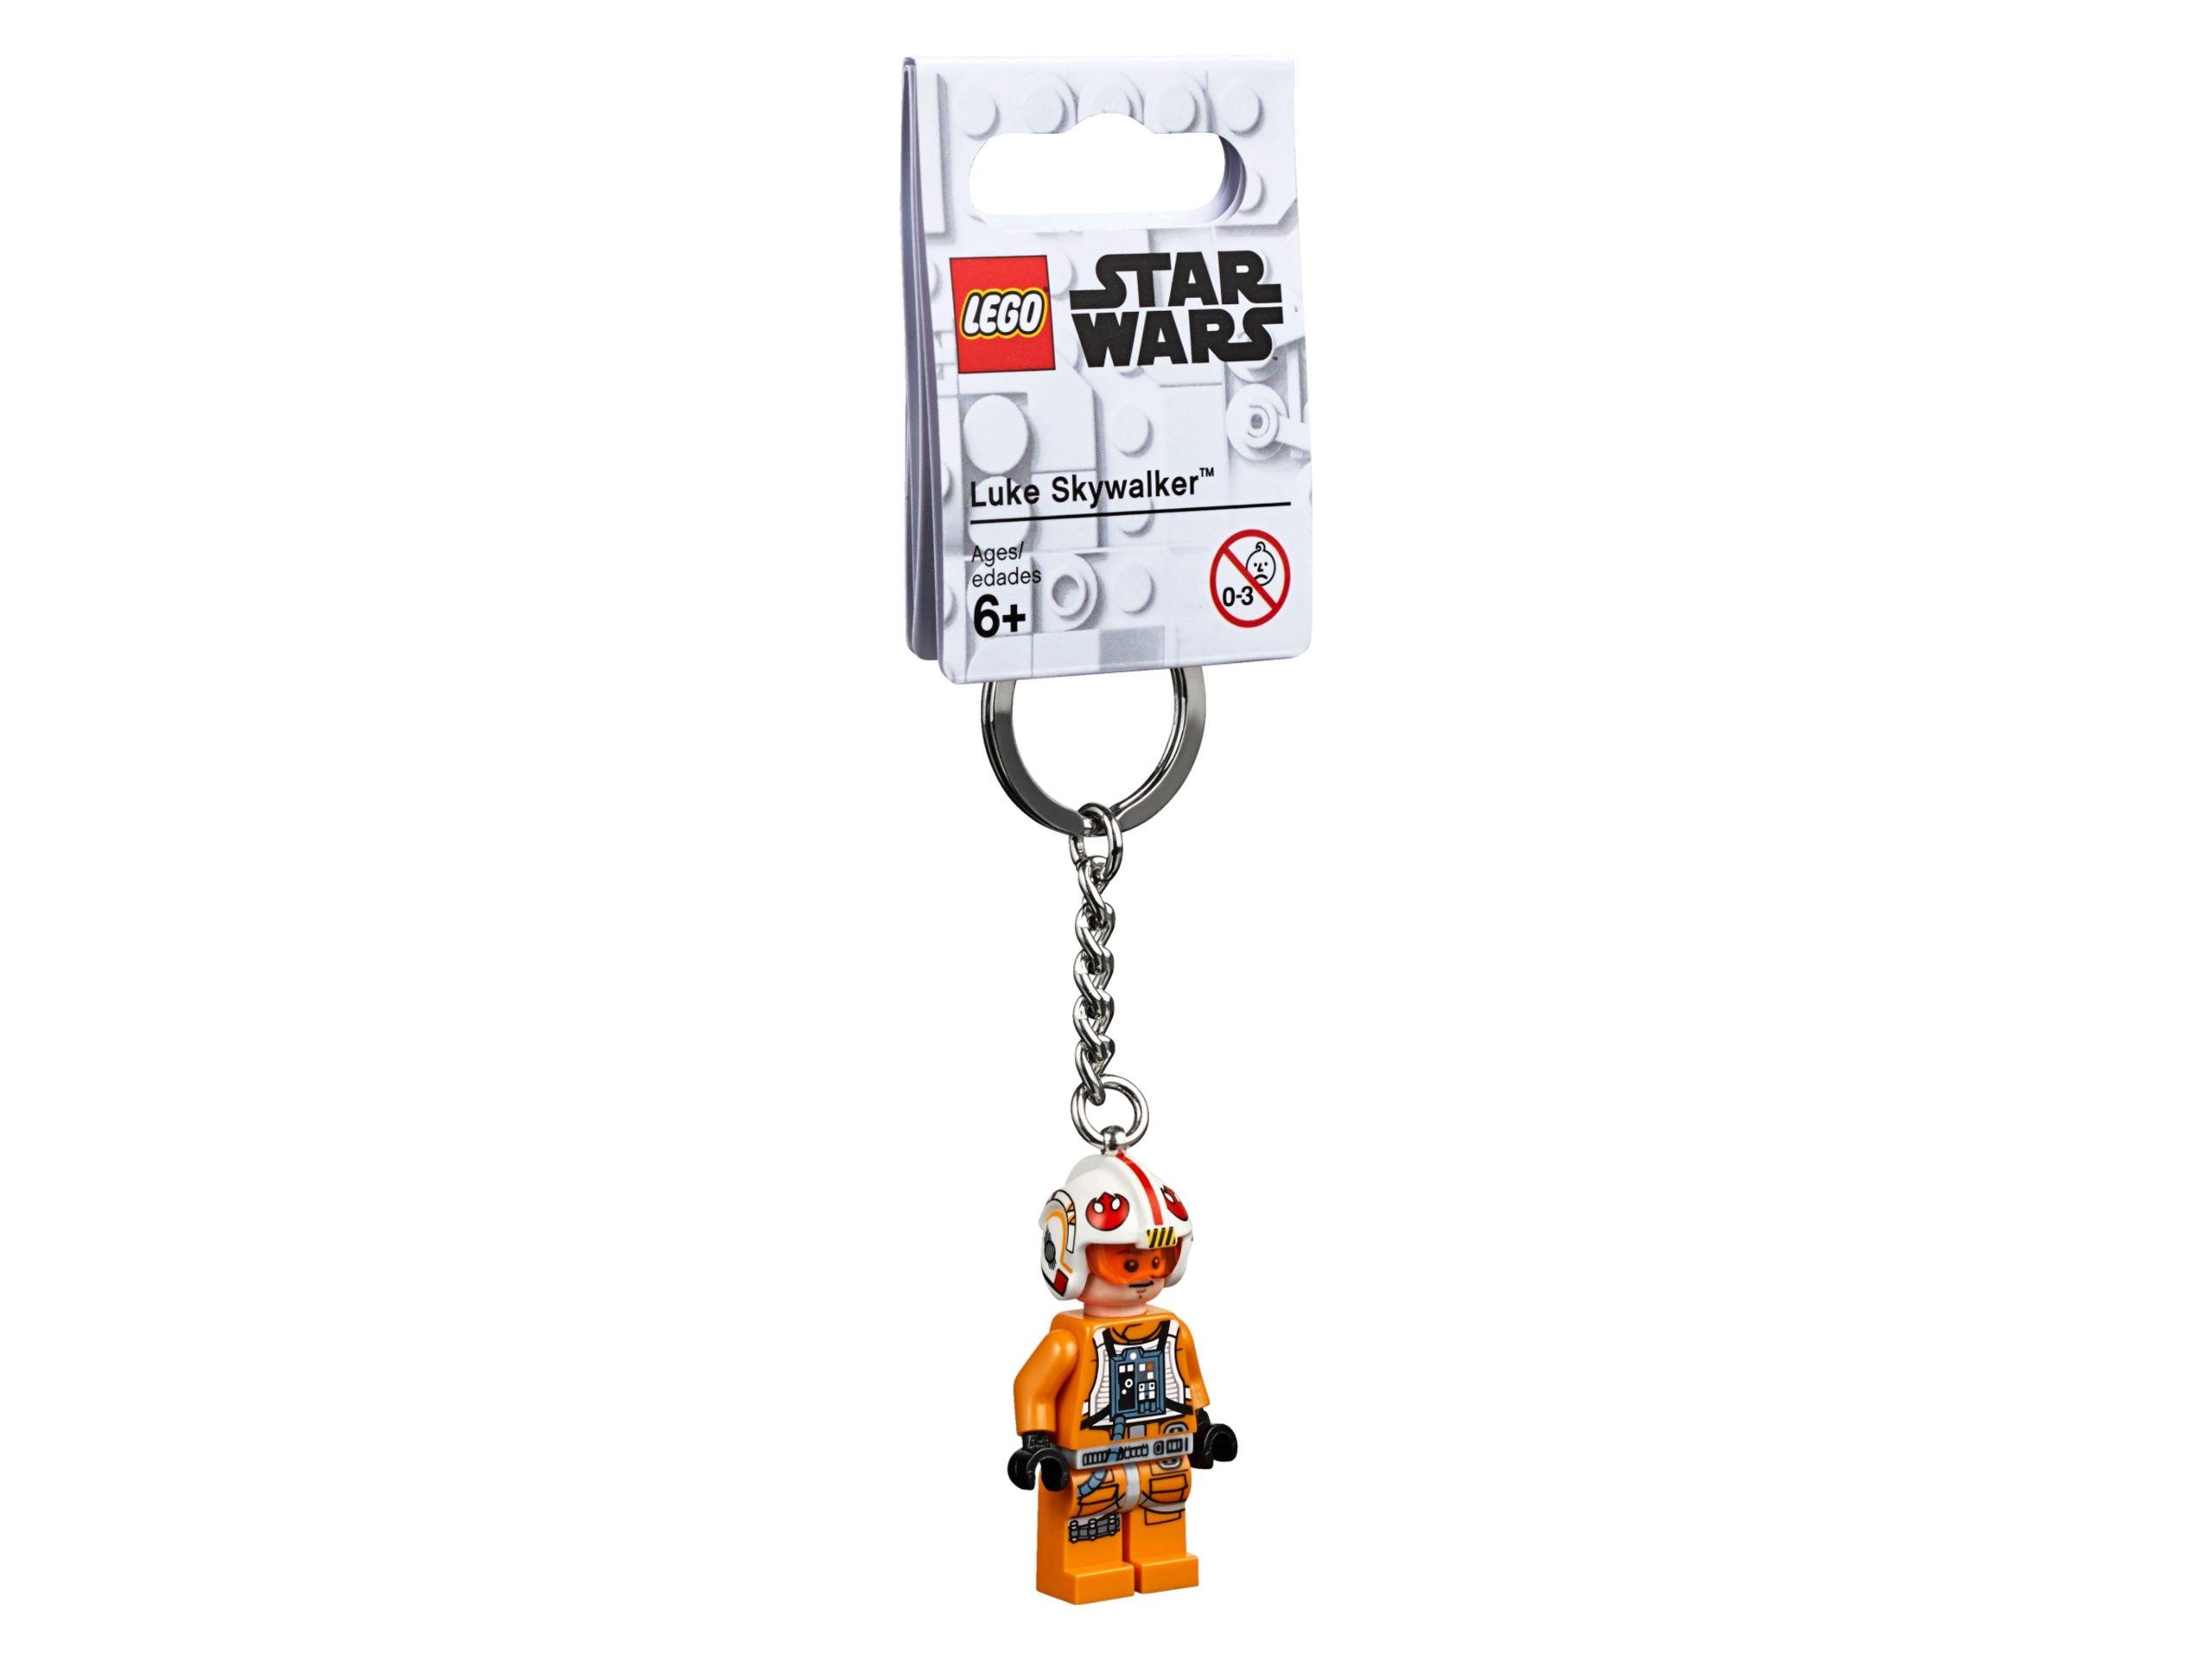 lego 853947 luke skywalker key chain scaled